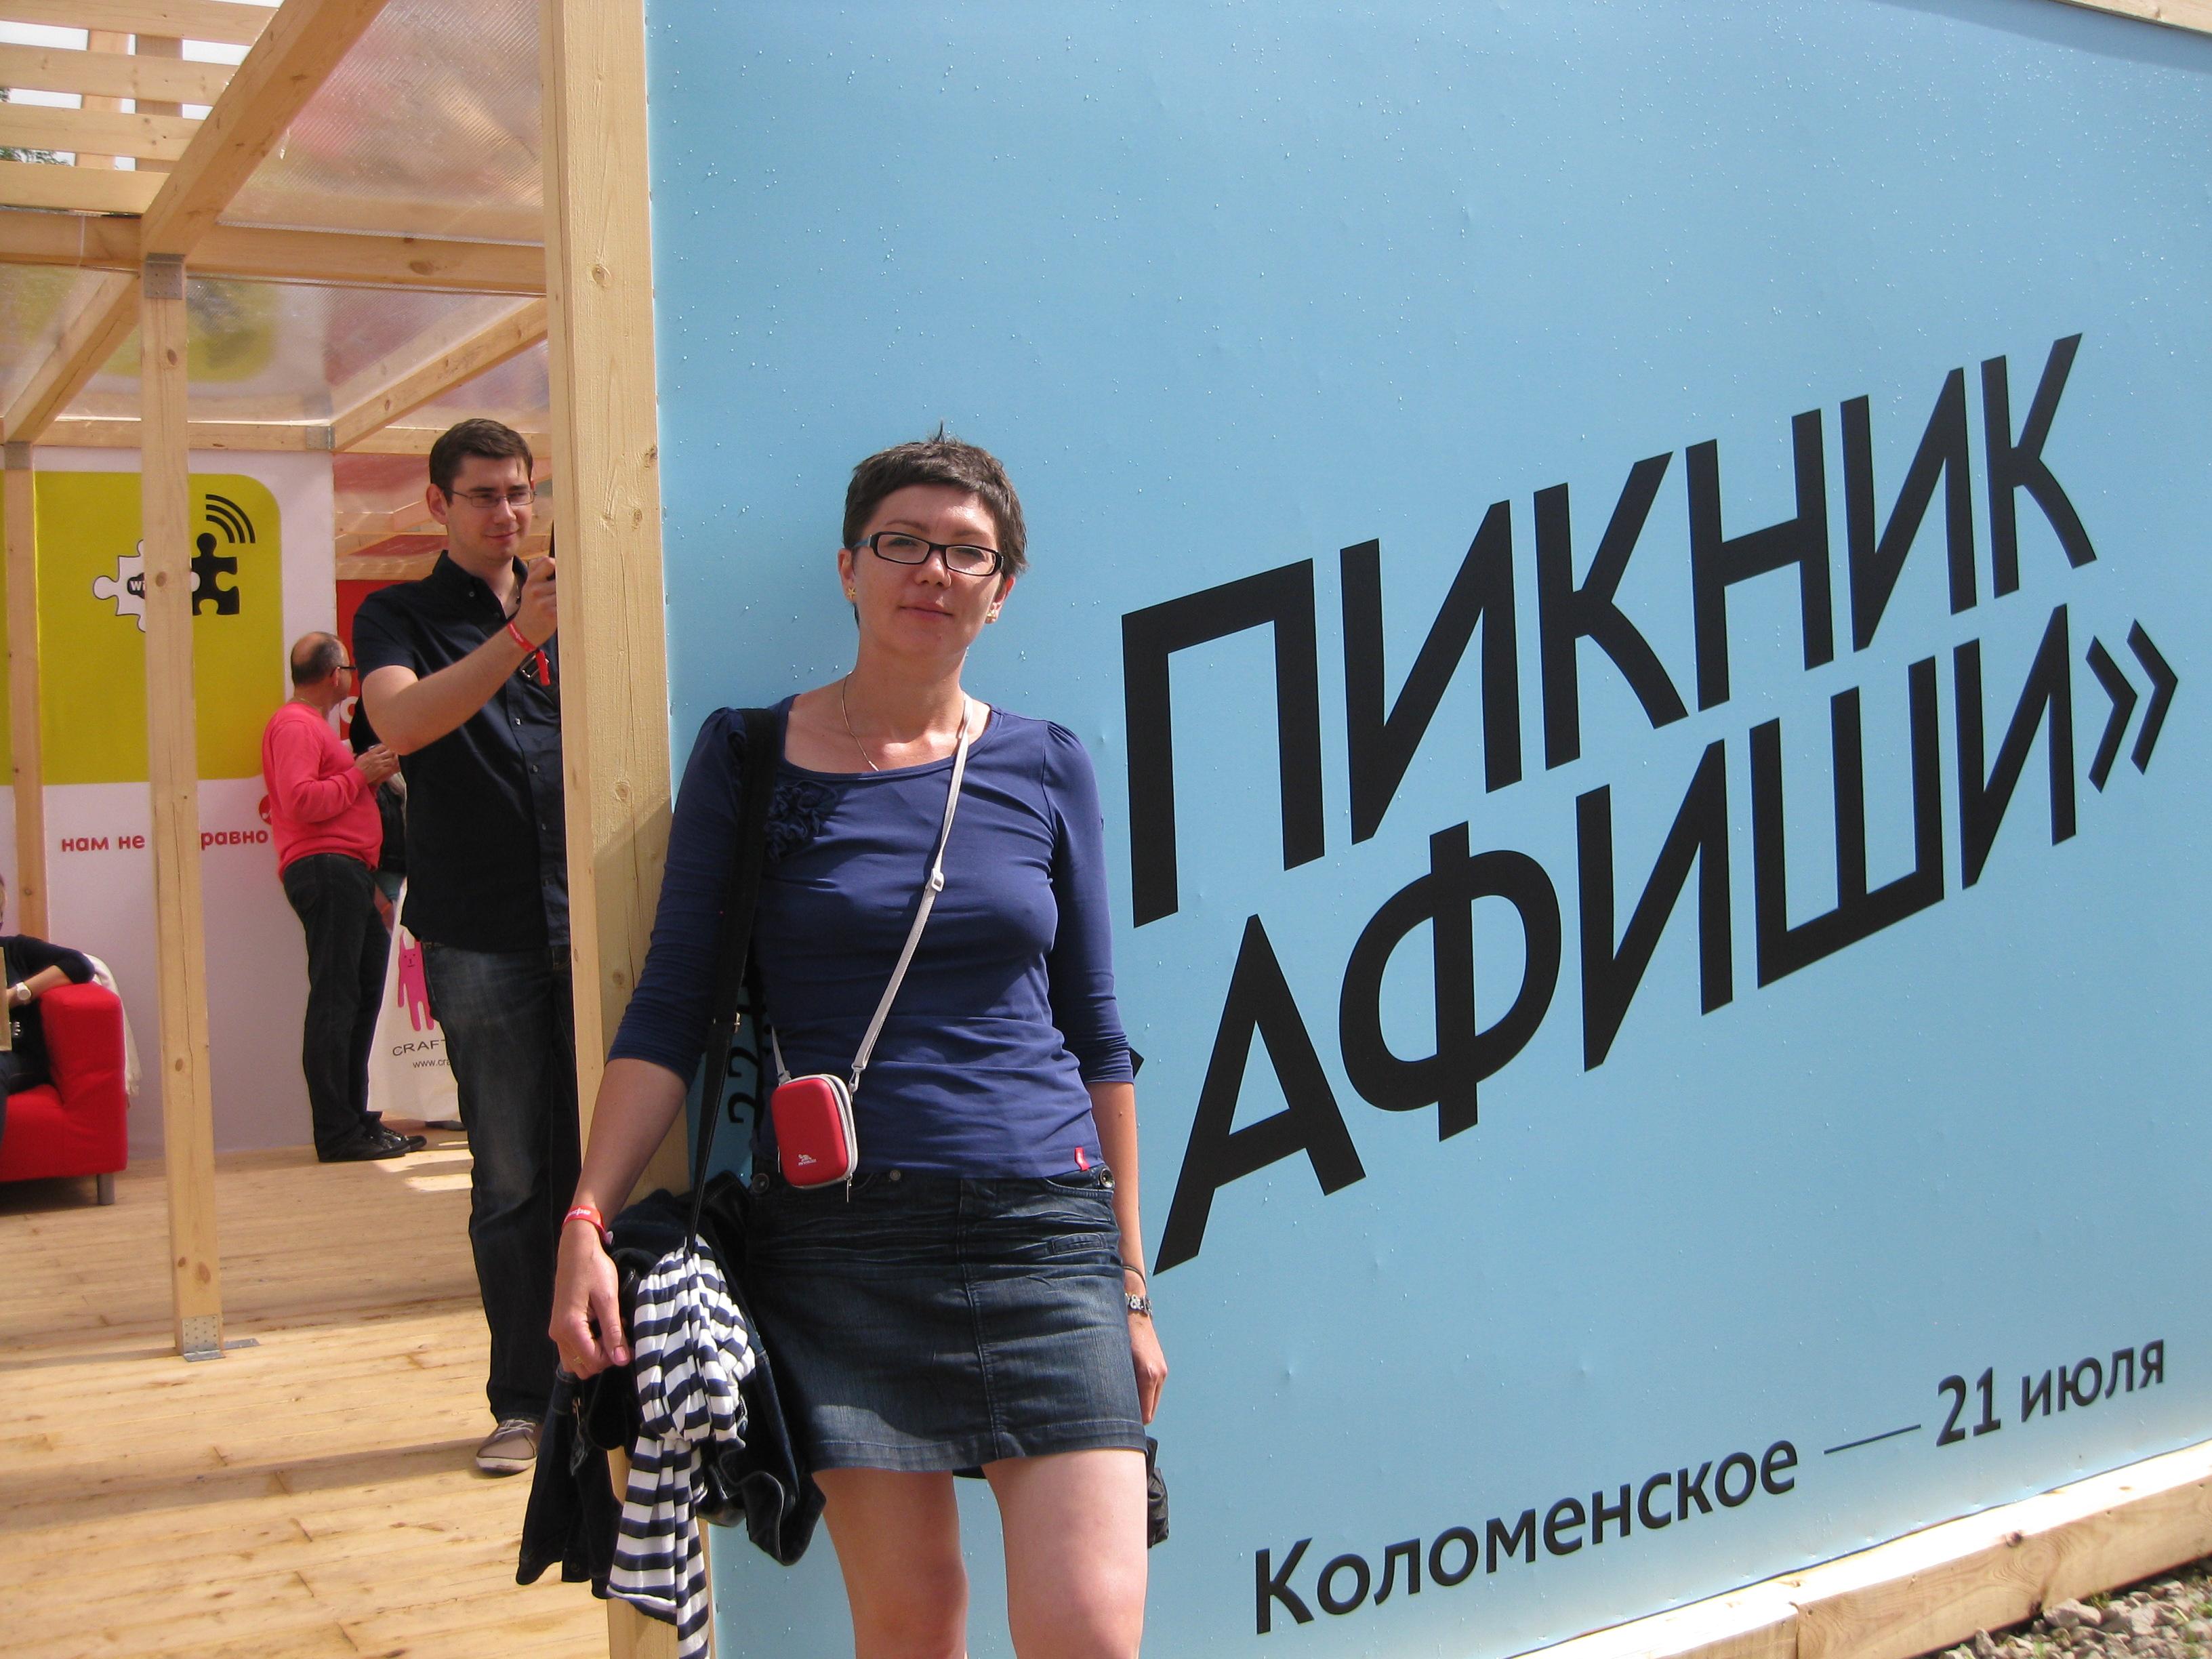 Заявка на ярмарку выходного дня в москве